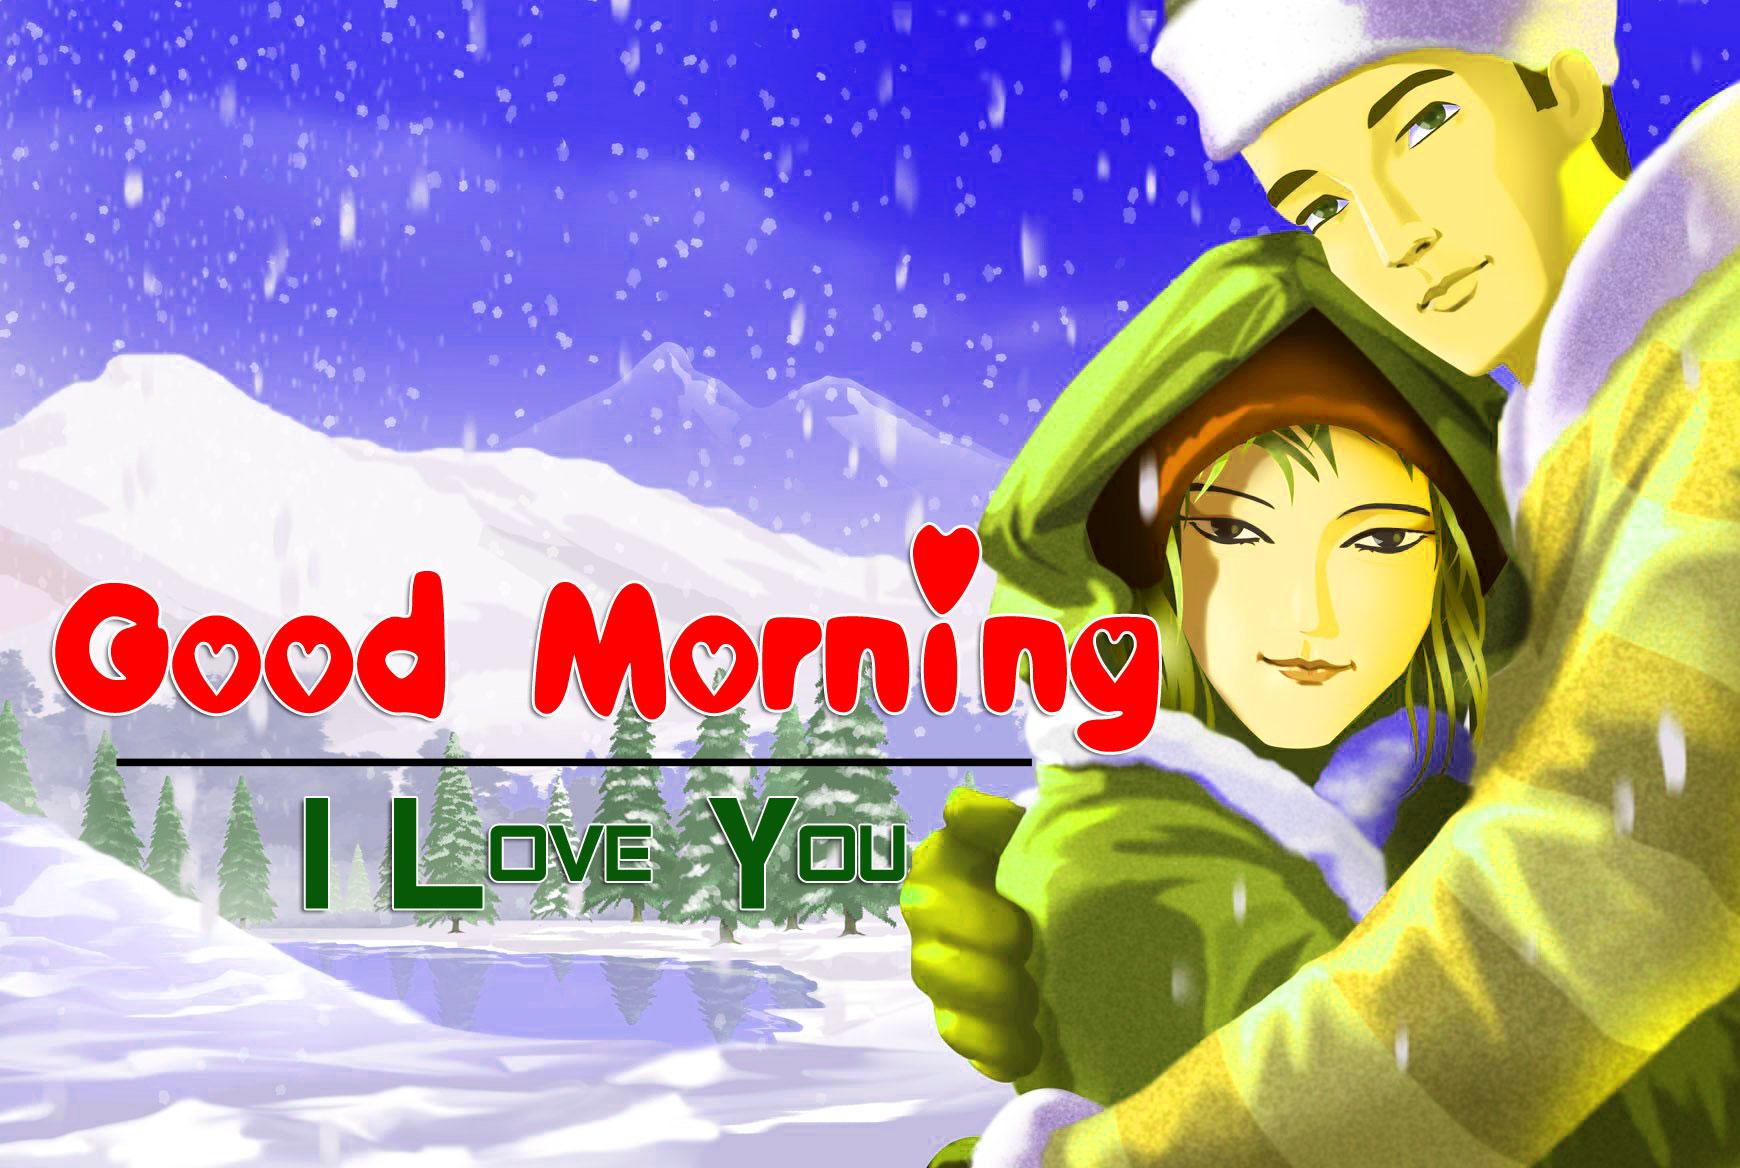 Romantic Good Morning Wallpaper Pics